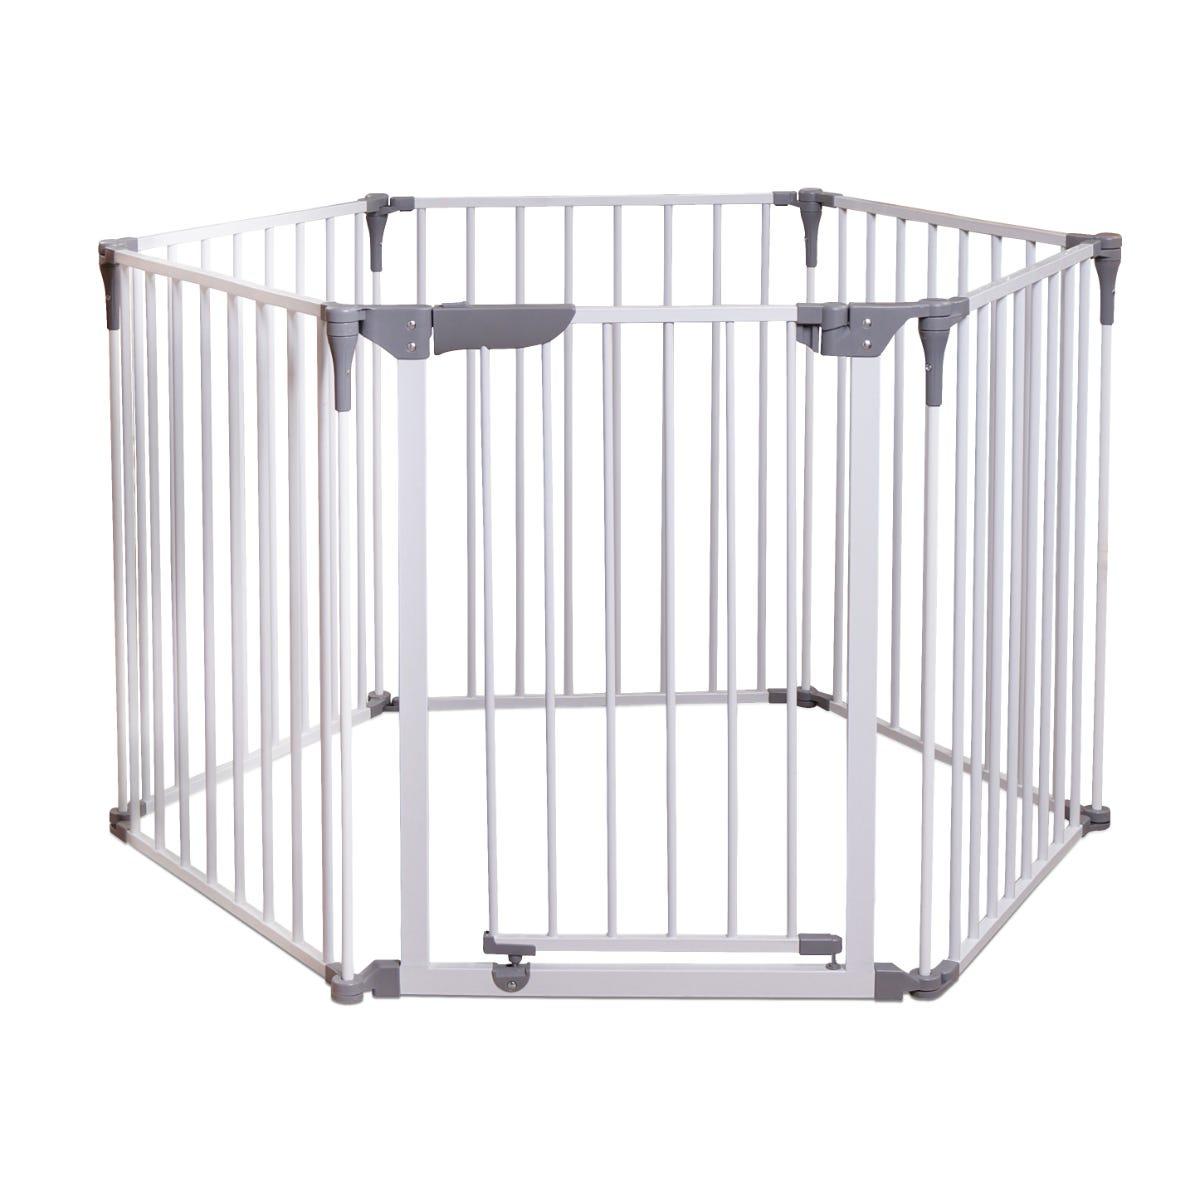 Dreambaby Royal Converta 3 In 1 Metal Playpen, Wide Barrier, Fire Barrier White